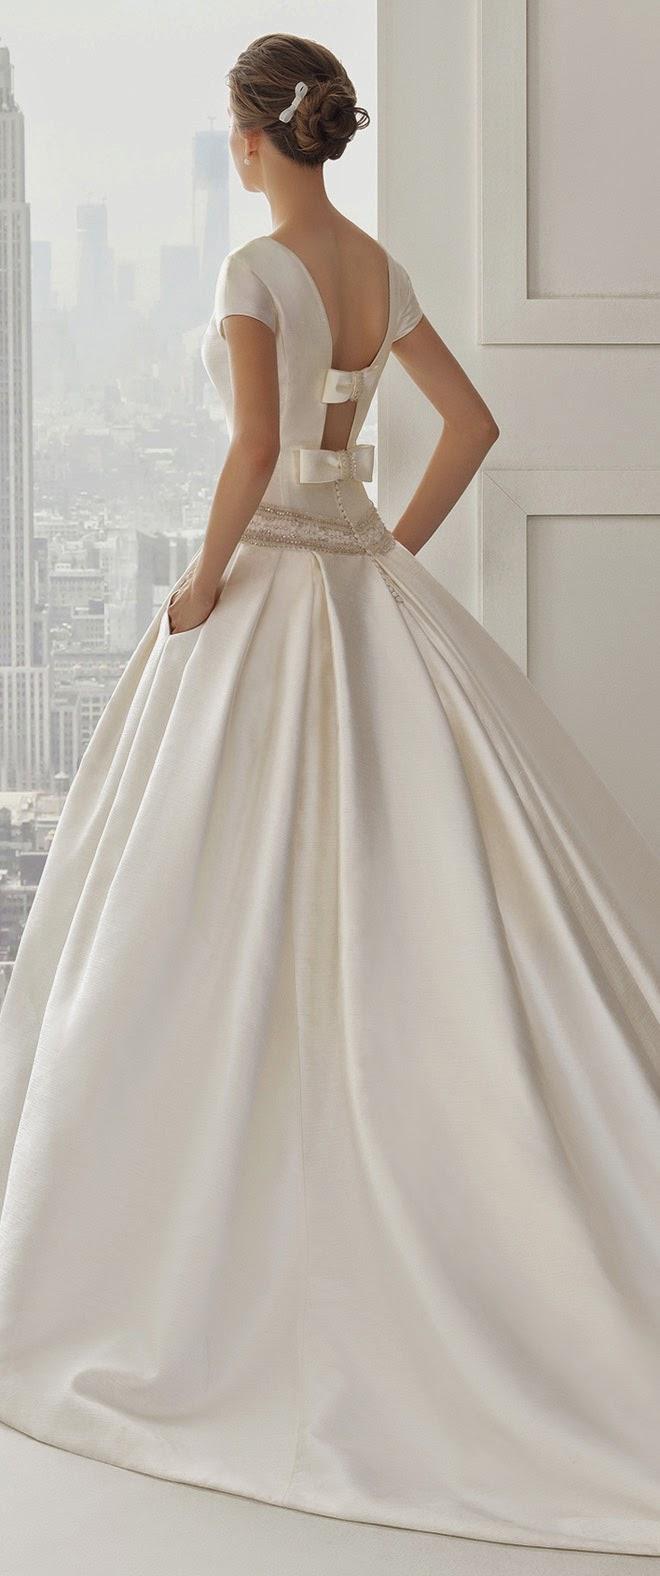 Rosa clara 2015 bridal collection part 2 fashion shared for Wedding dress rosa clara